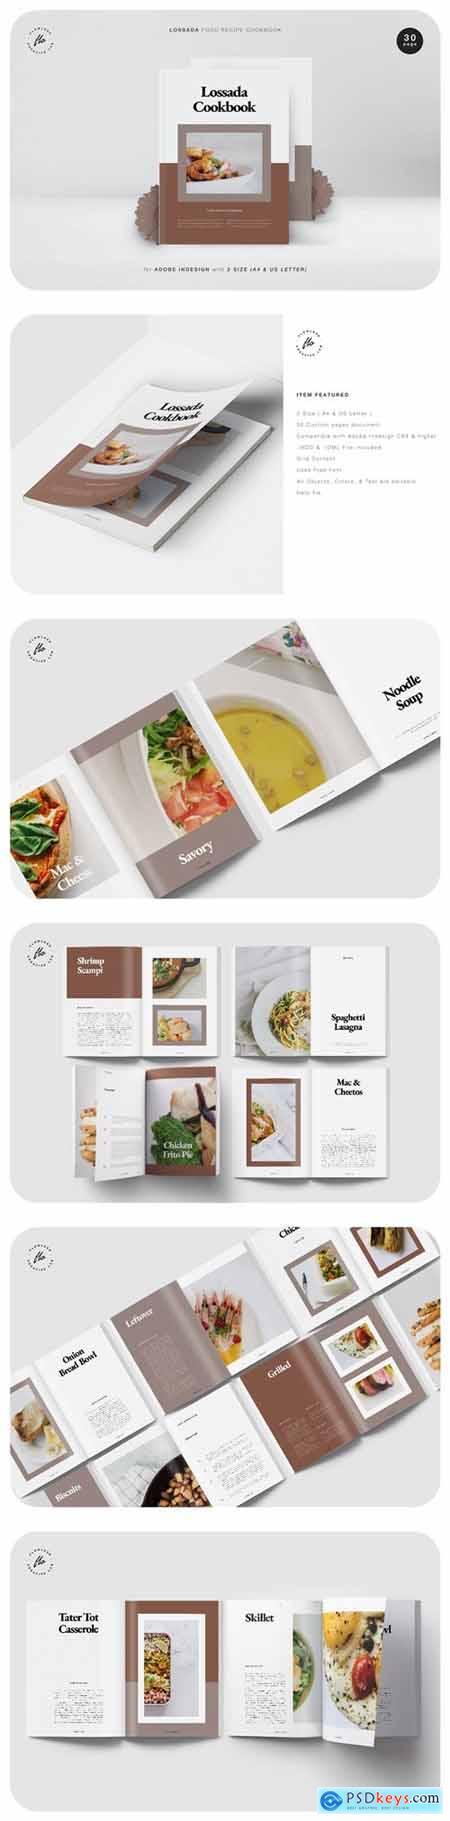 Lossada Food Recipe Cookbook